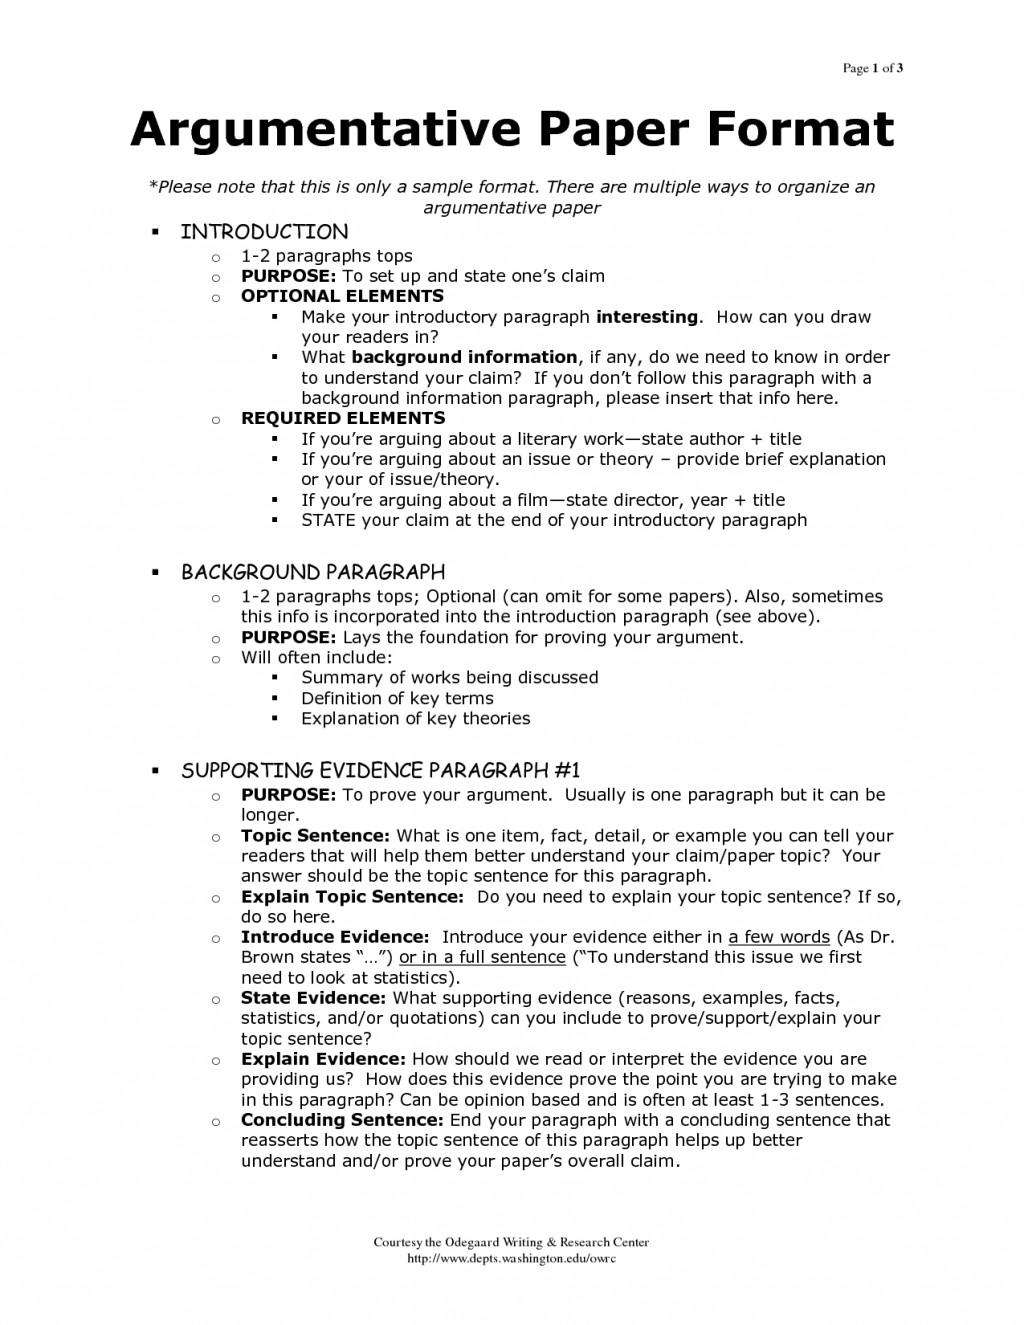 003 Essay Example Argument Remarkable Outline Sample 5 Paragraph Argumentative Template Blank Large